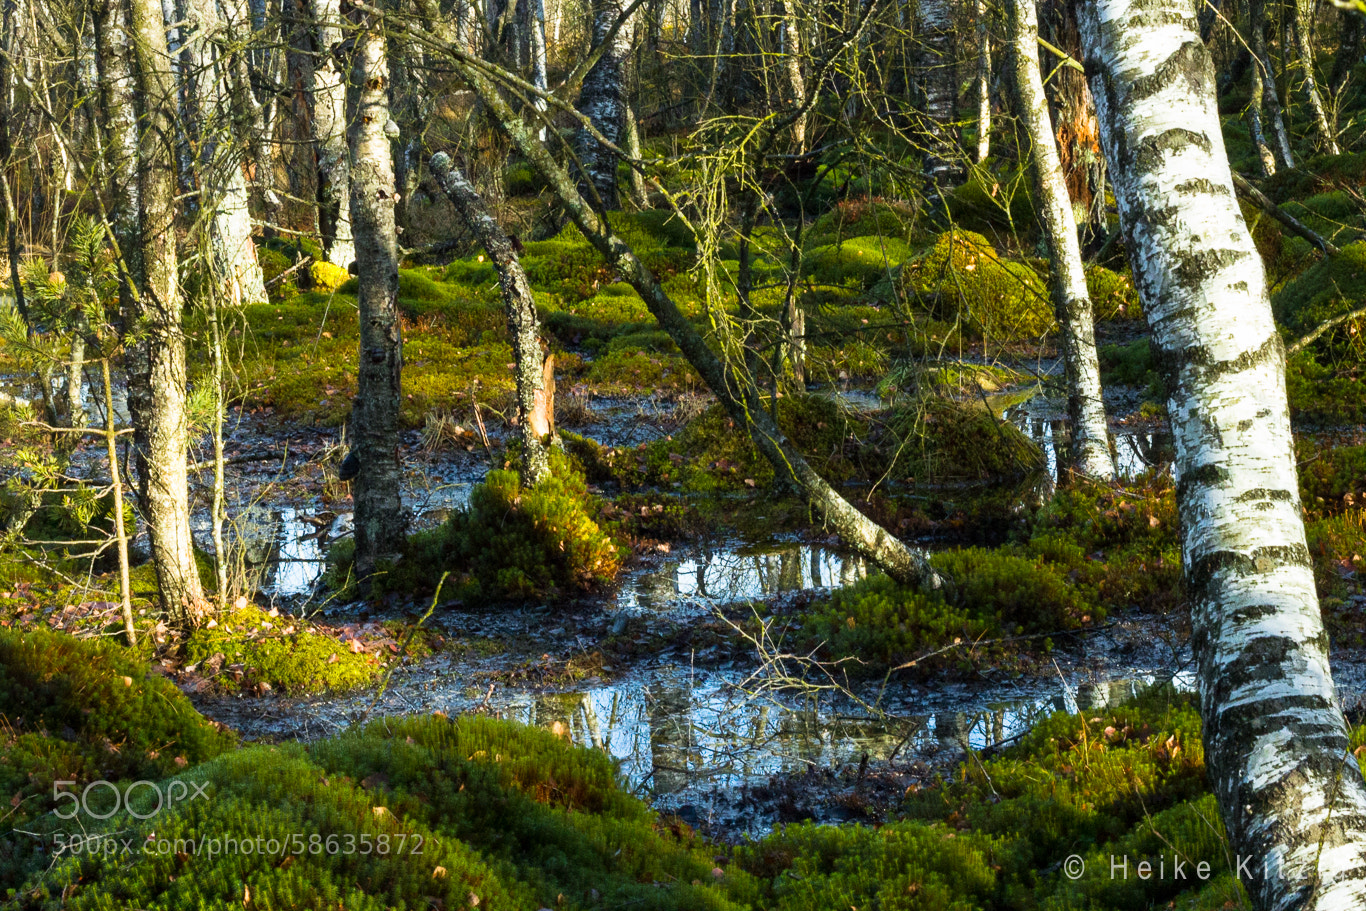 Photograph Moss in Schwenningen Germany 2 by Heike Kitzig on 500px